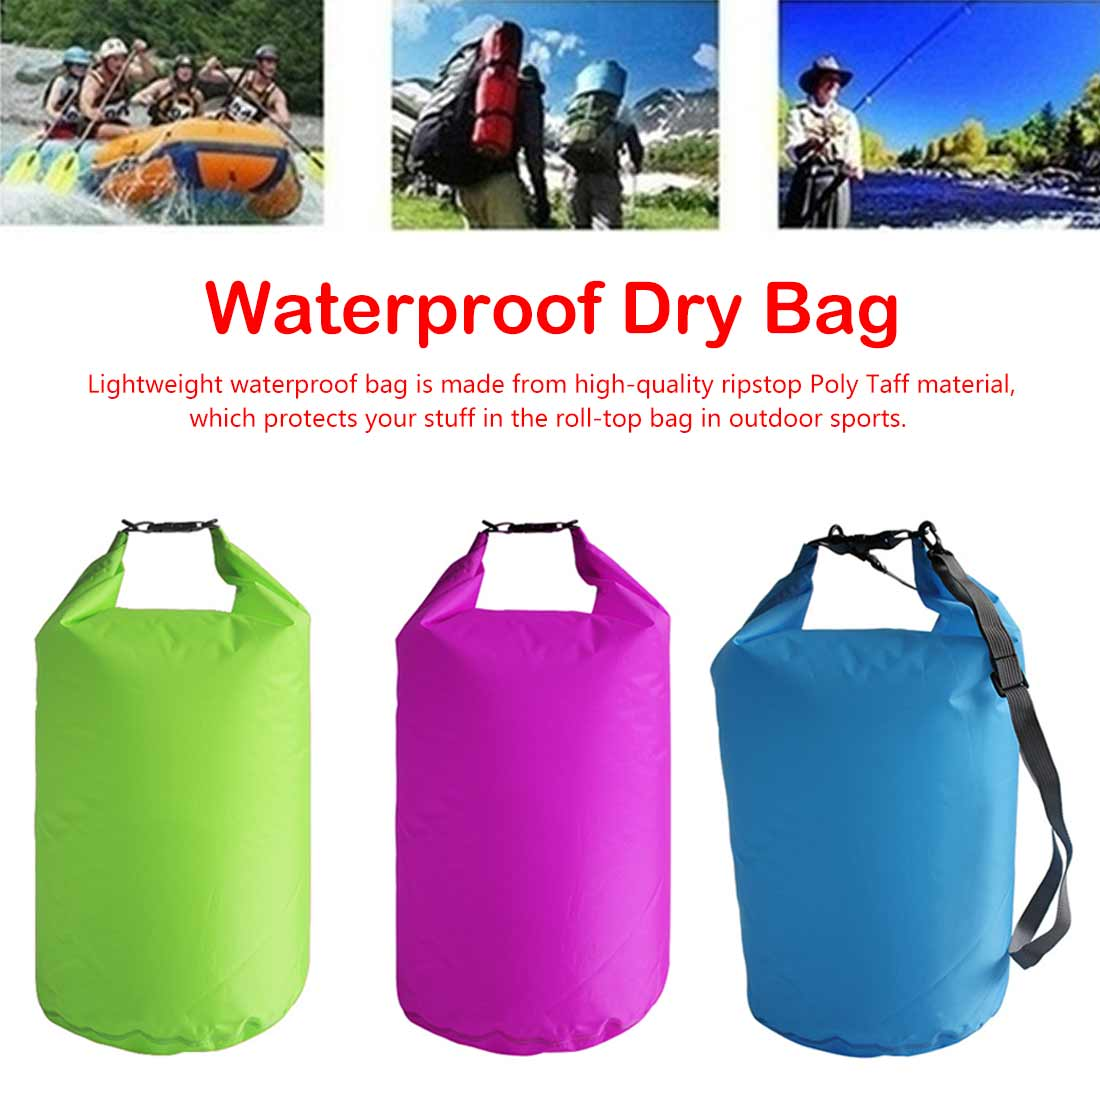 For Boating Fishing Rafting Swimming 5L/10L/20L/40L/70 Outdoor Dry Waterproof Bag Dry Bag Sack Waterproof Floating Dry Gear Bags